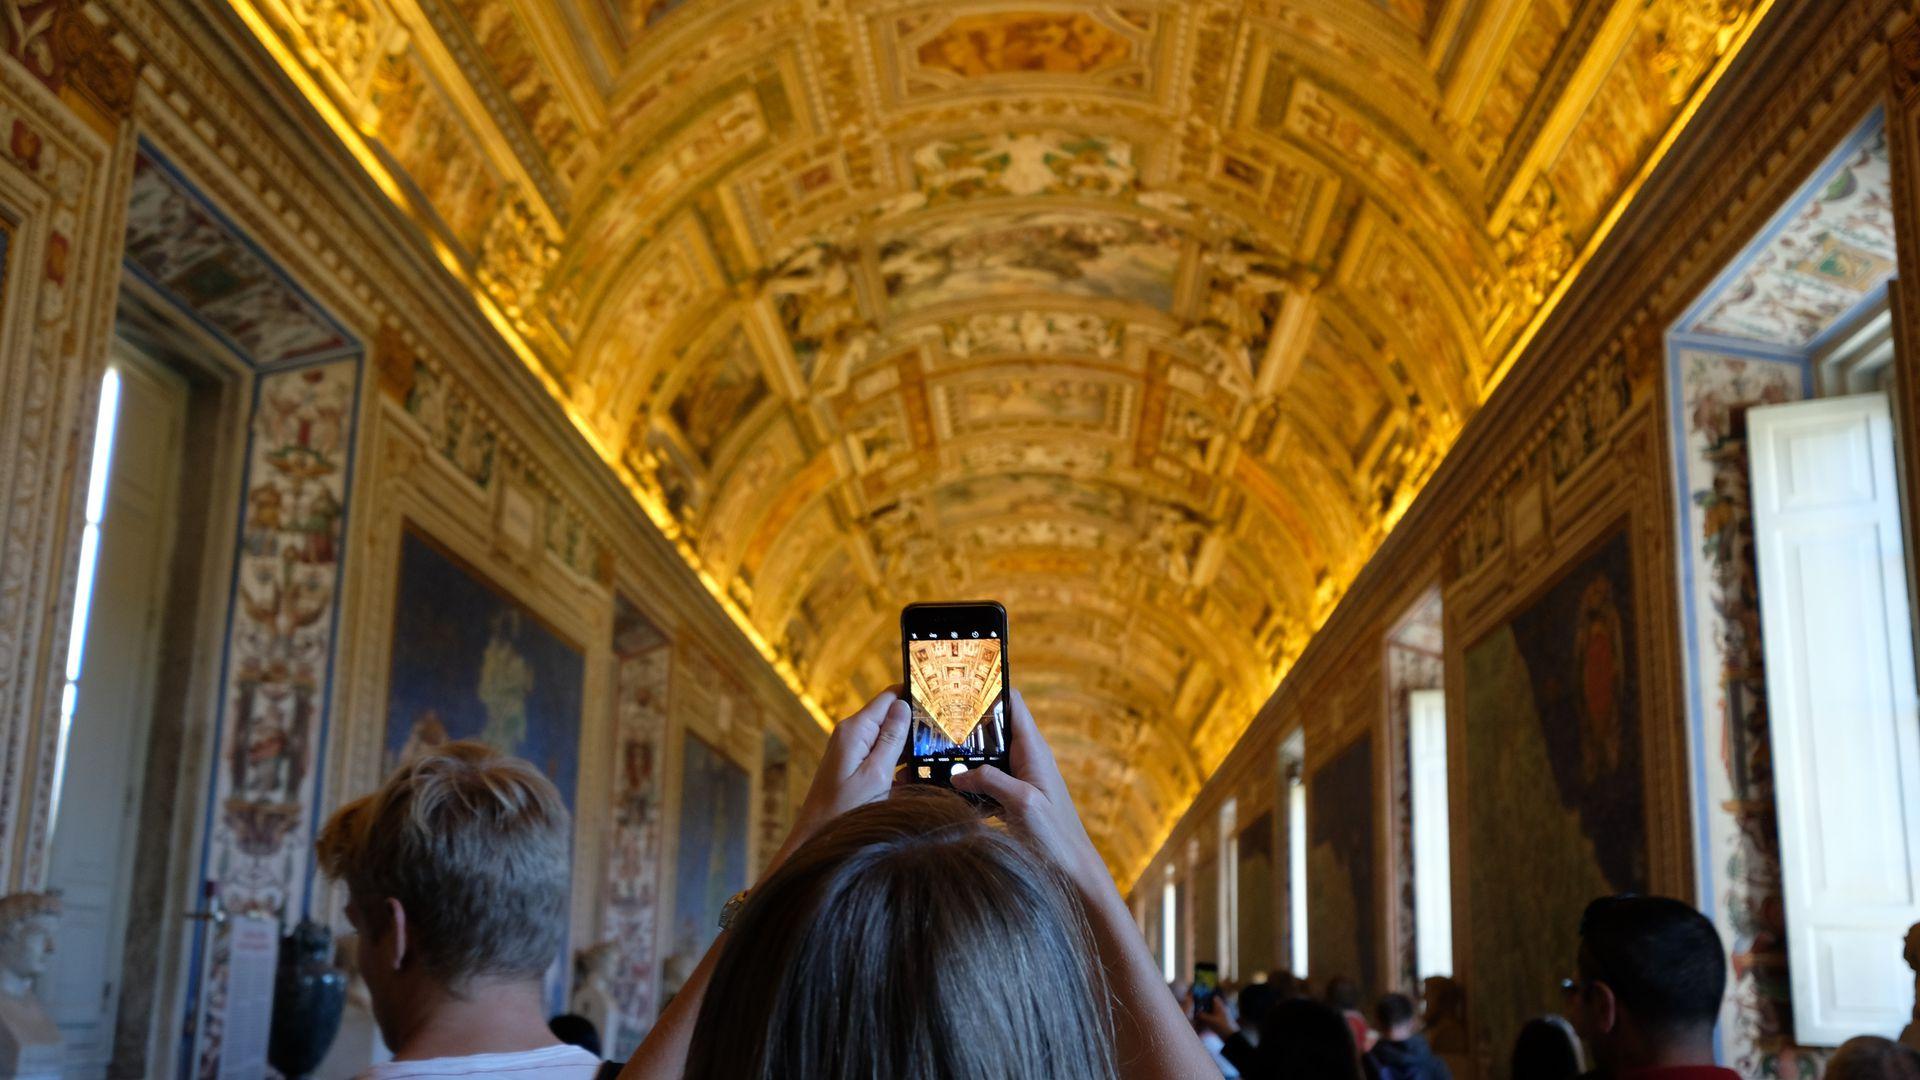 Vatican Museums & Sistine Chapel: Skip The Line & Audio Tour on Mobile App